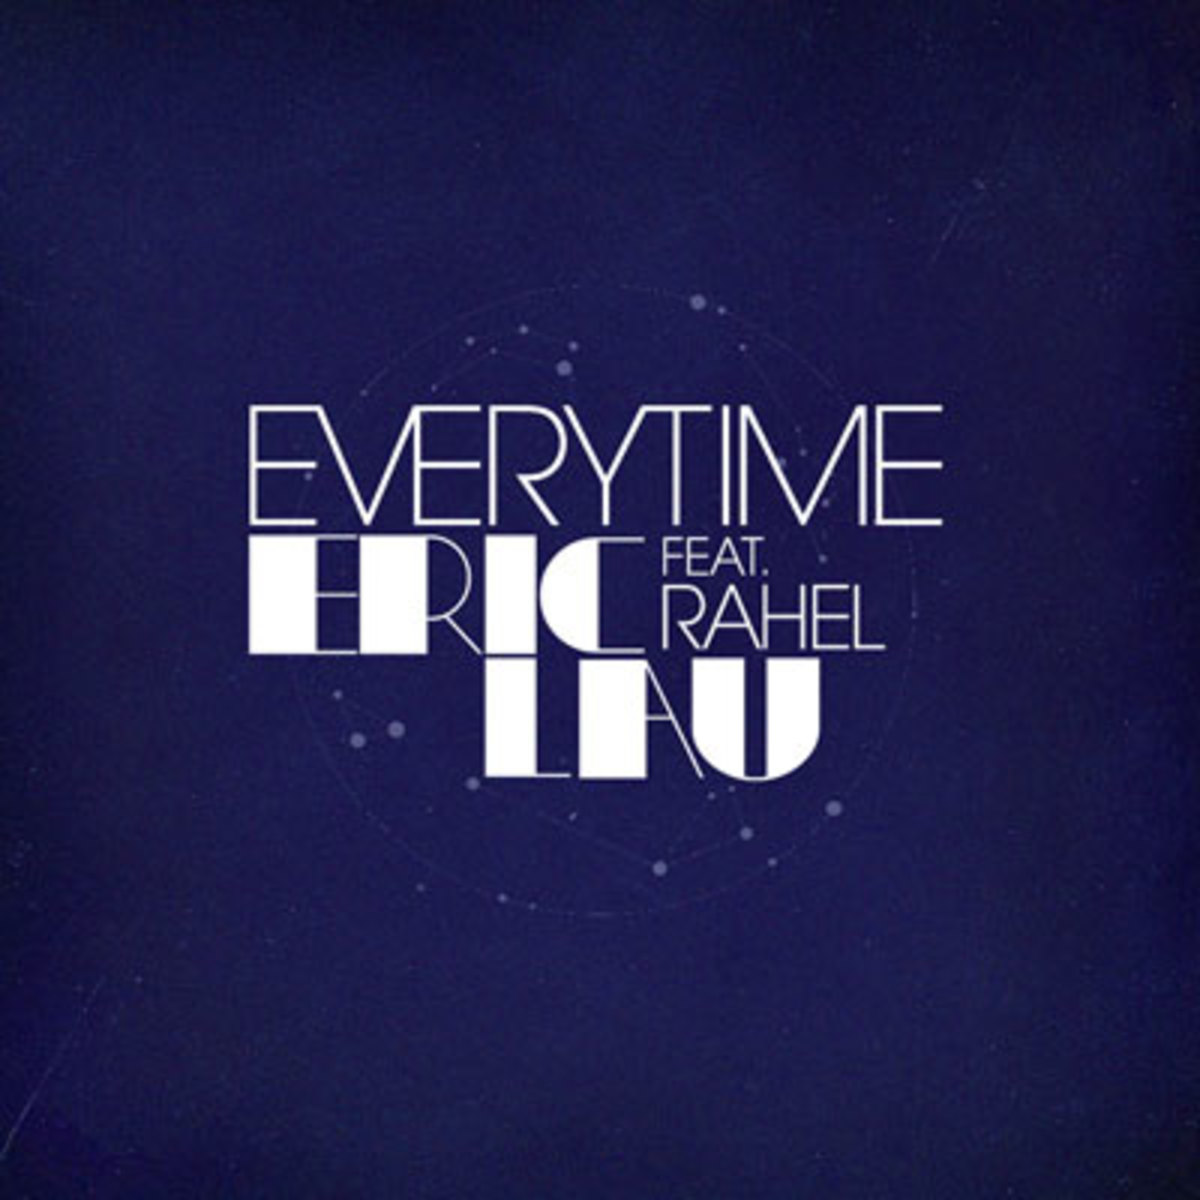 ericlau-everytime.jpg